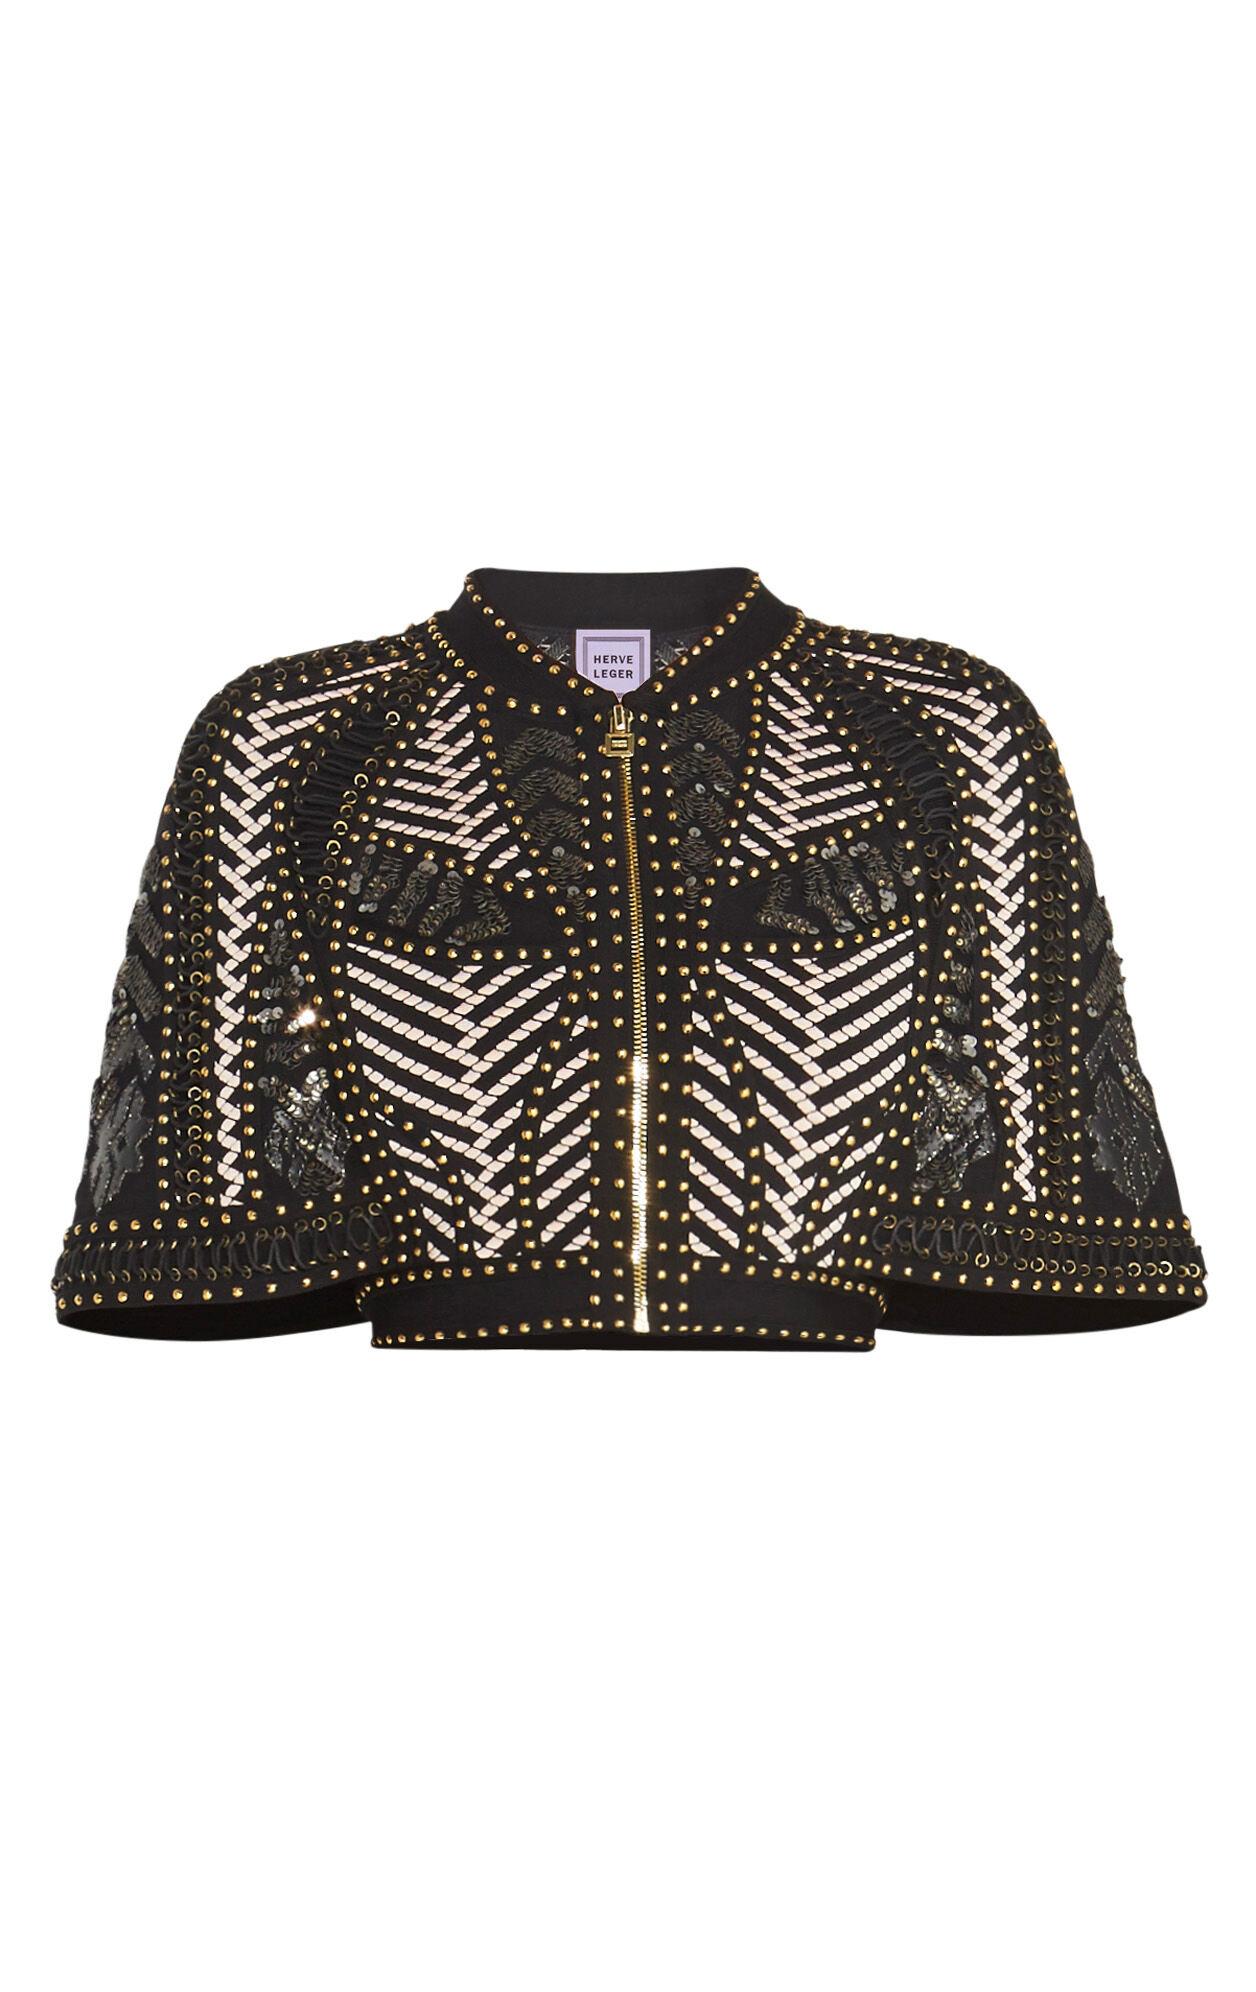 Violeta Mosaic Lacing Stud Detail Jacket